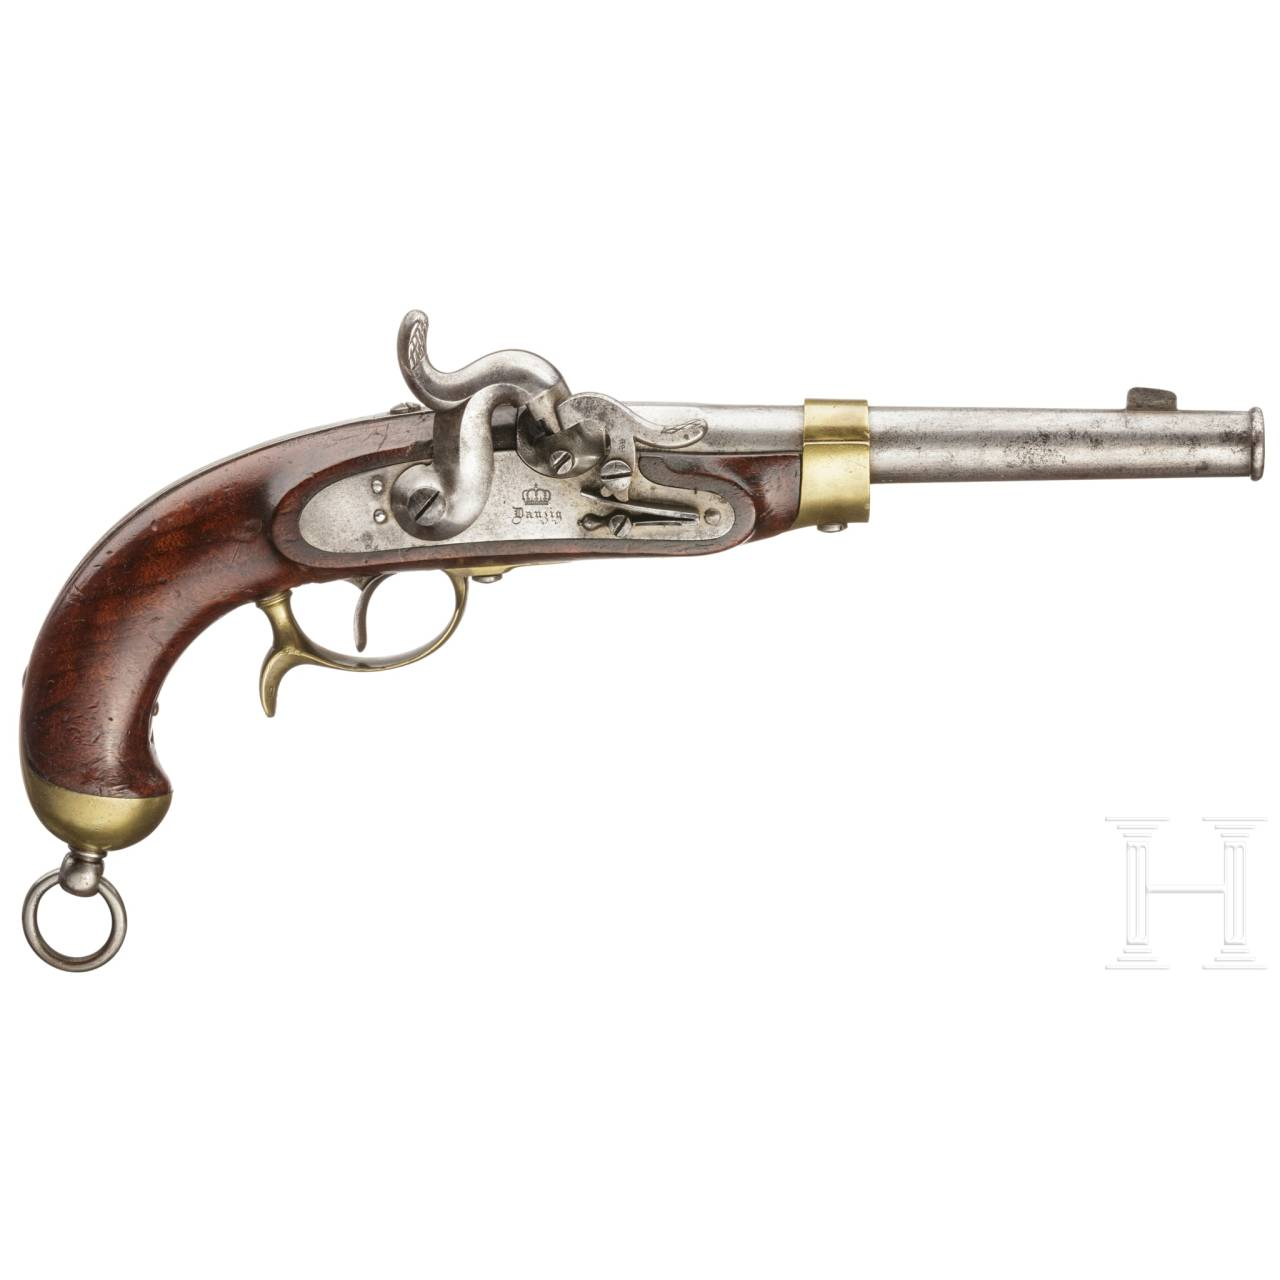 A German cavallery percussion pistol M 1850, Danzig, 1853